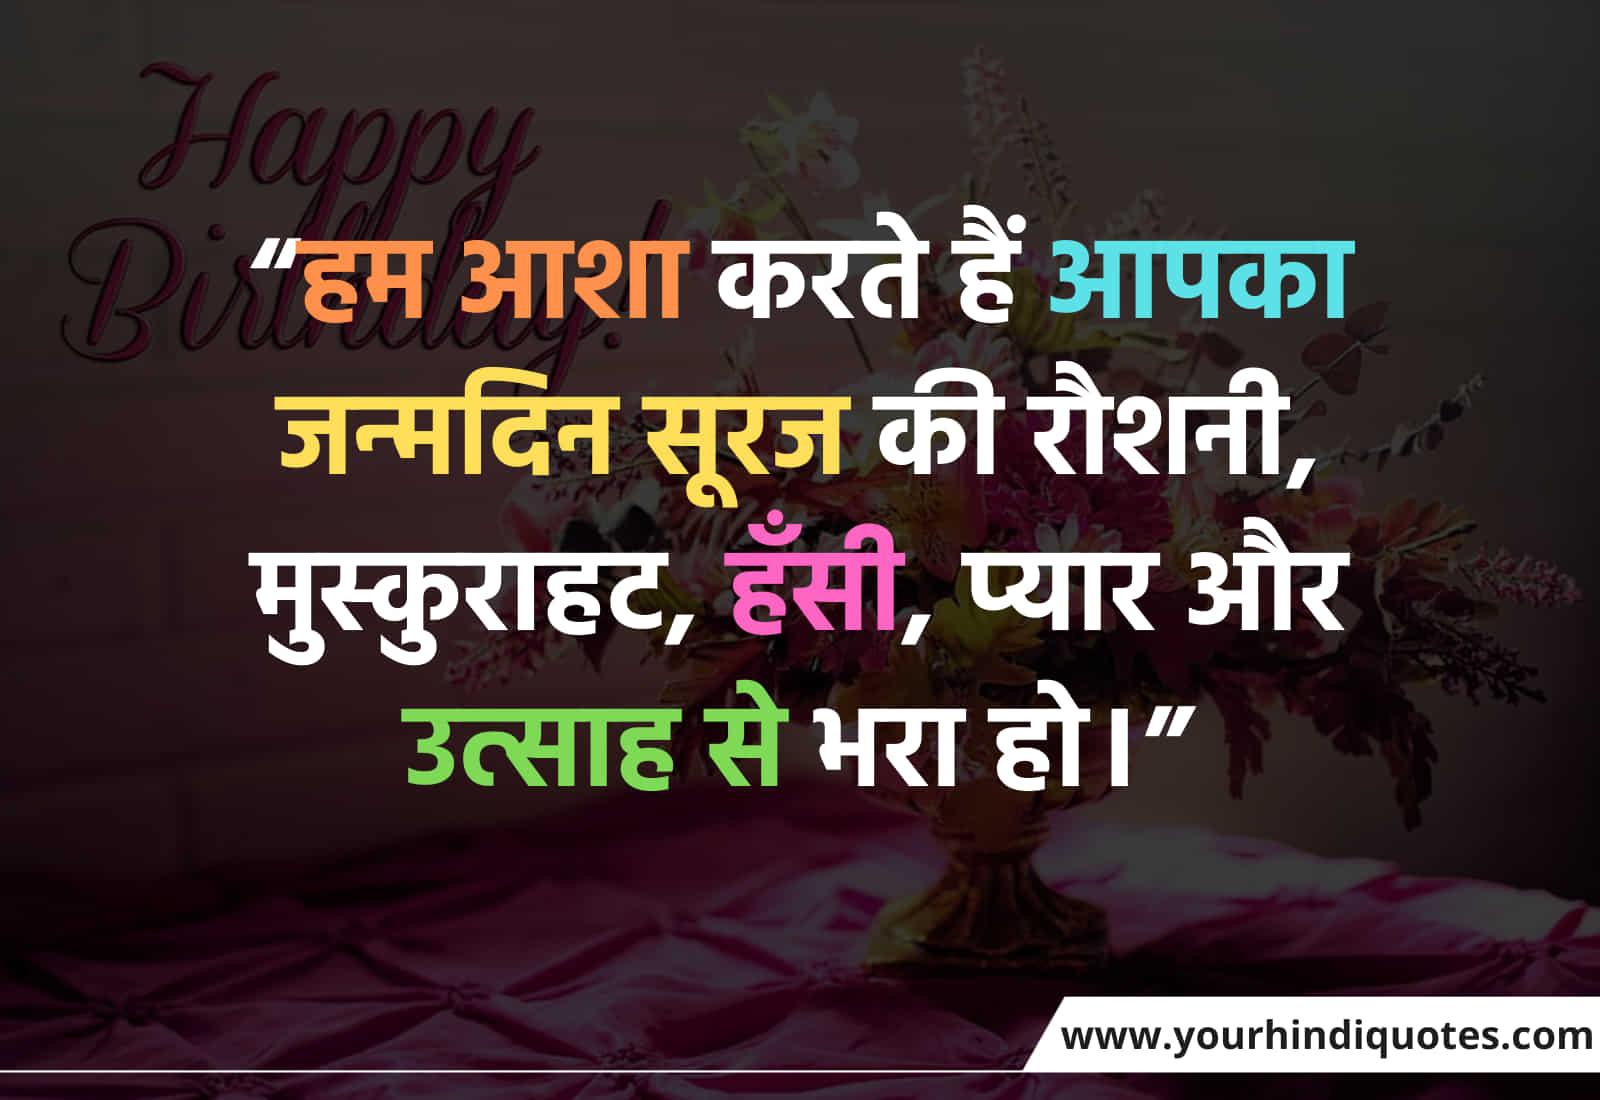 Hindi Birthday Wishes For Gf